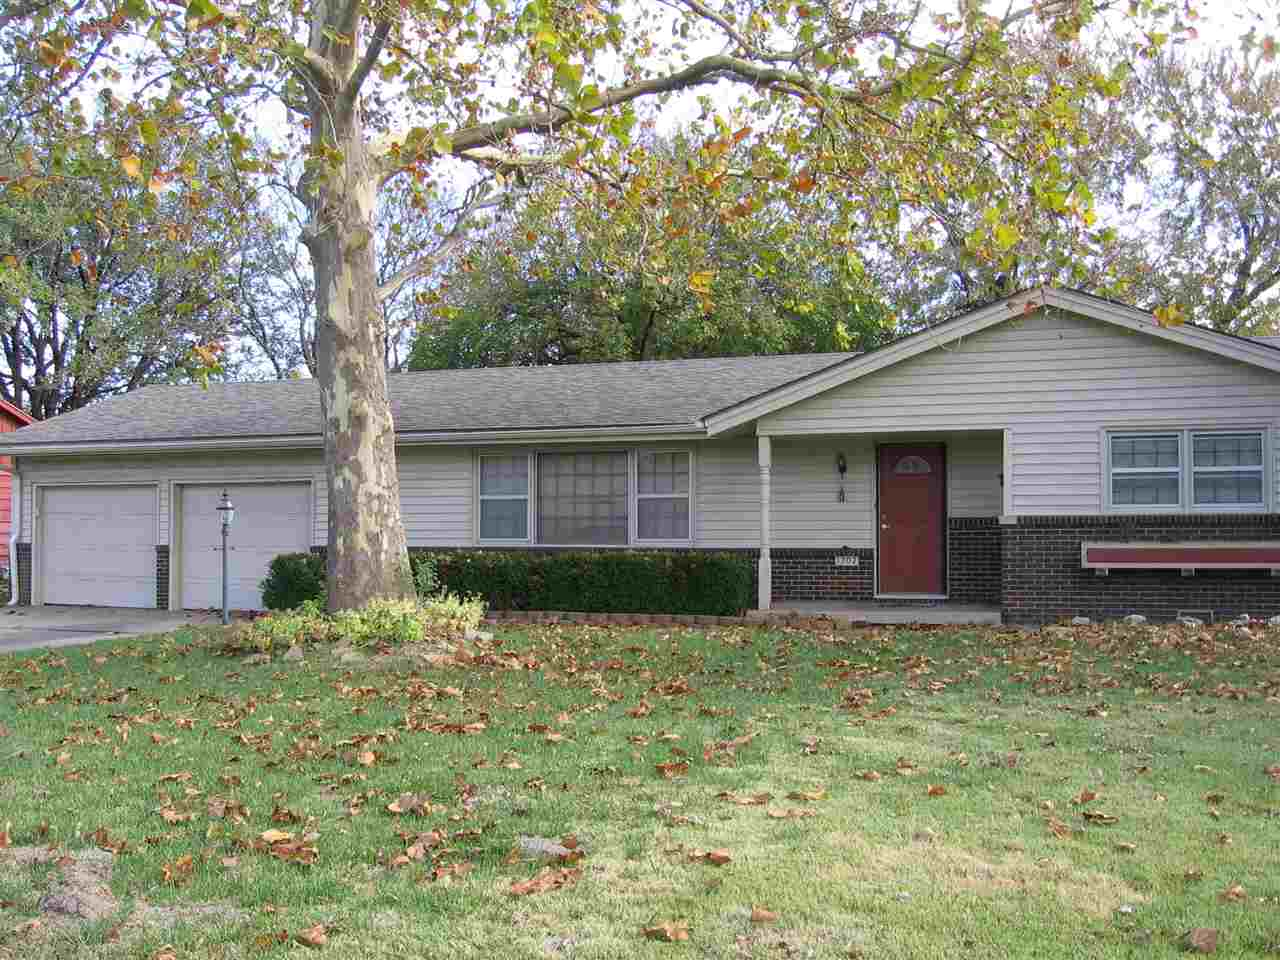 1702 N Charles St., Wichita, KS 67203